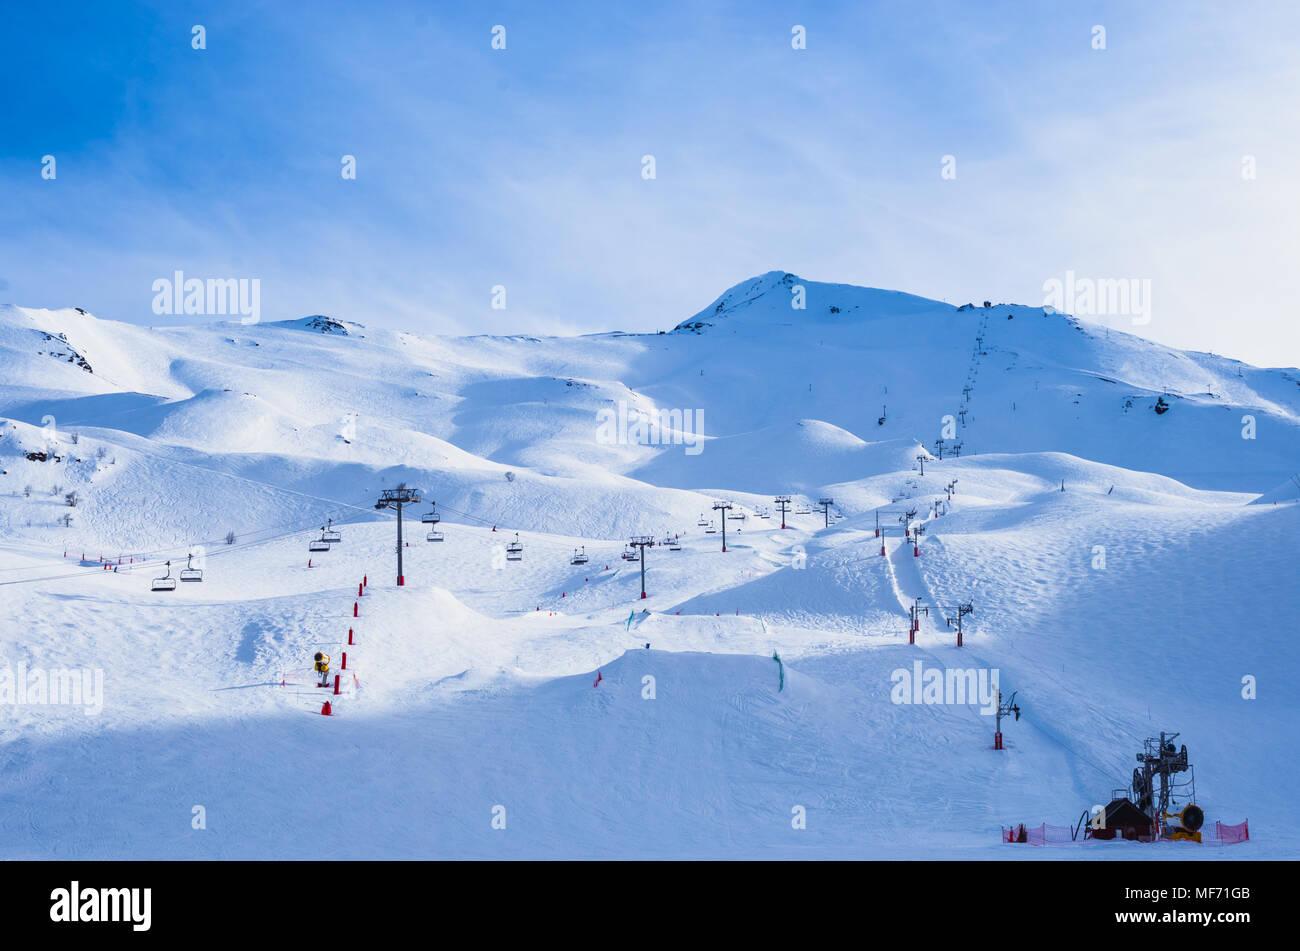 Empty ski resort of Piau-Engaly, Pyrenees, France - Stock Image